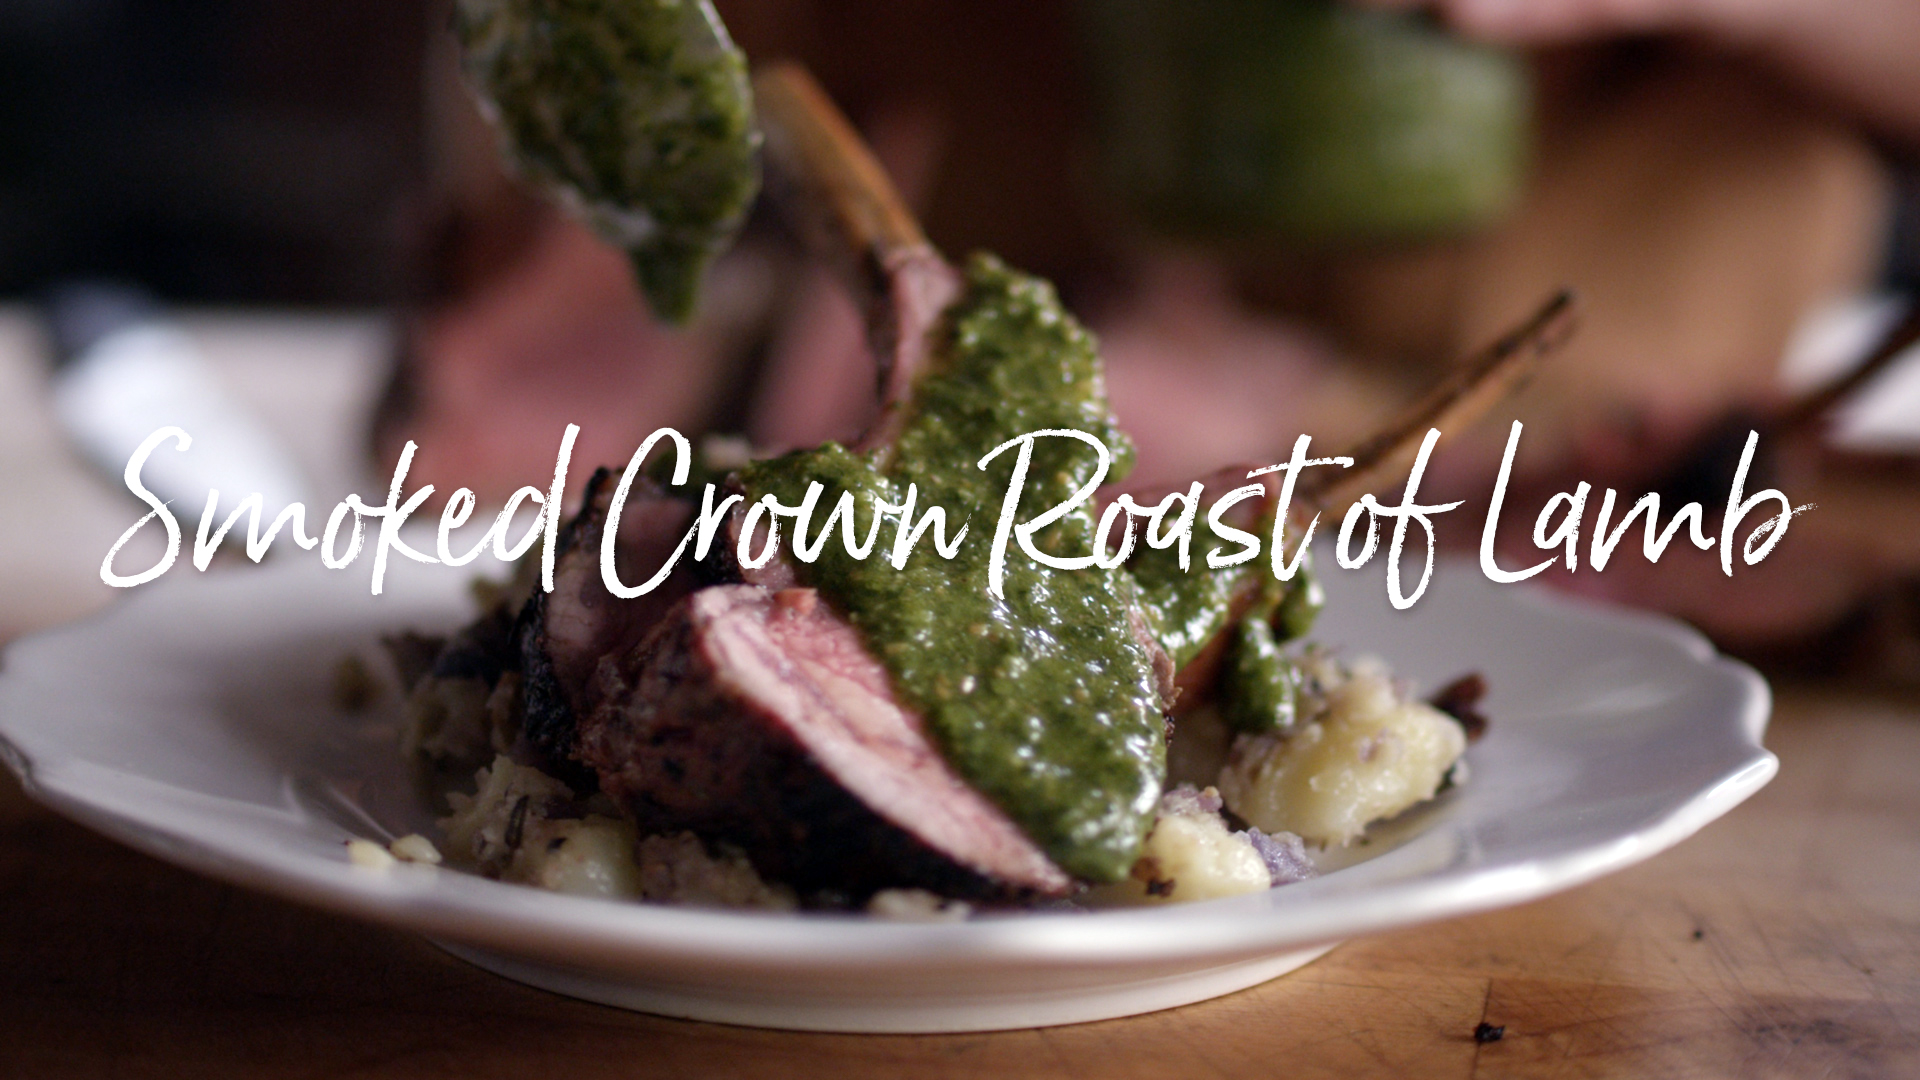 Smoked Crown Roast of Lamb